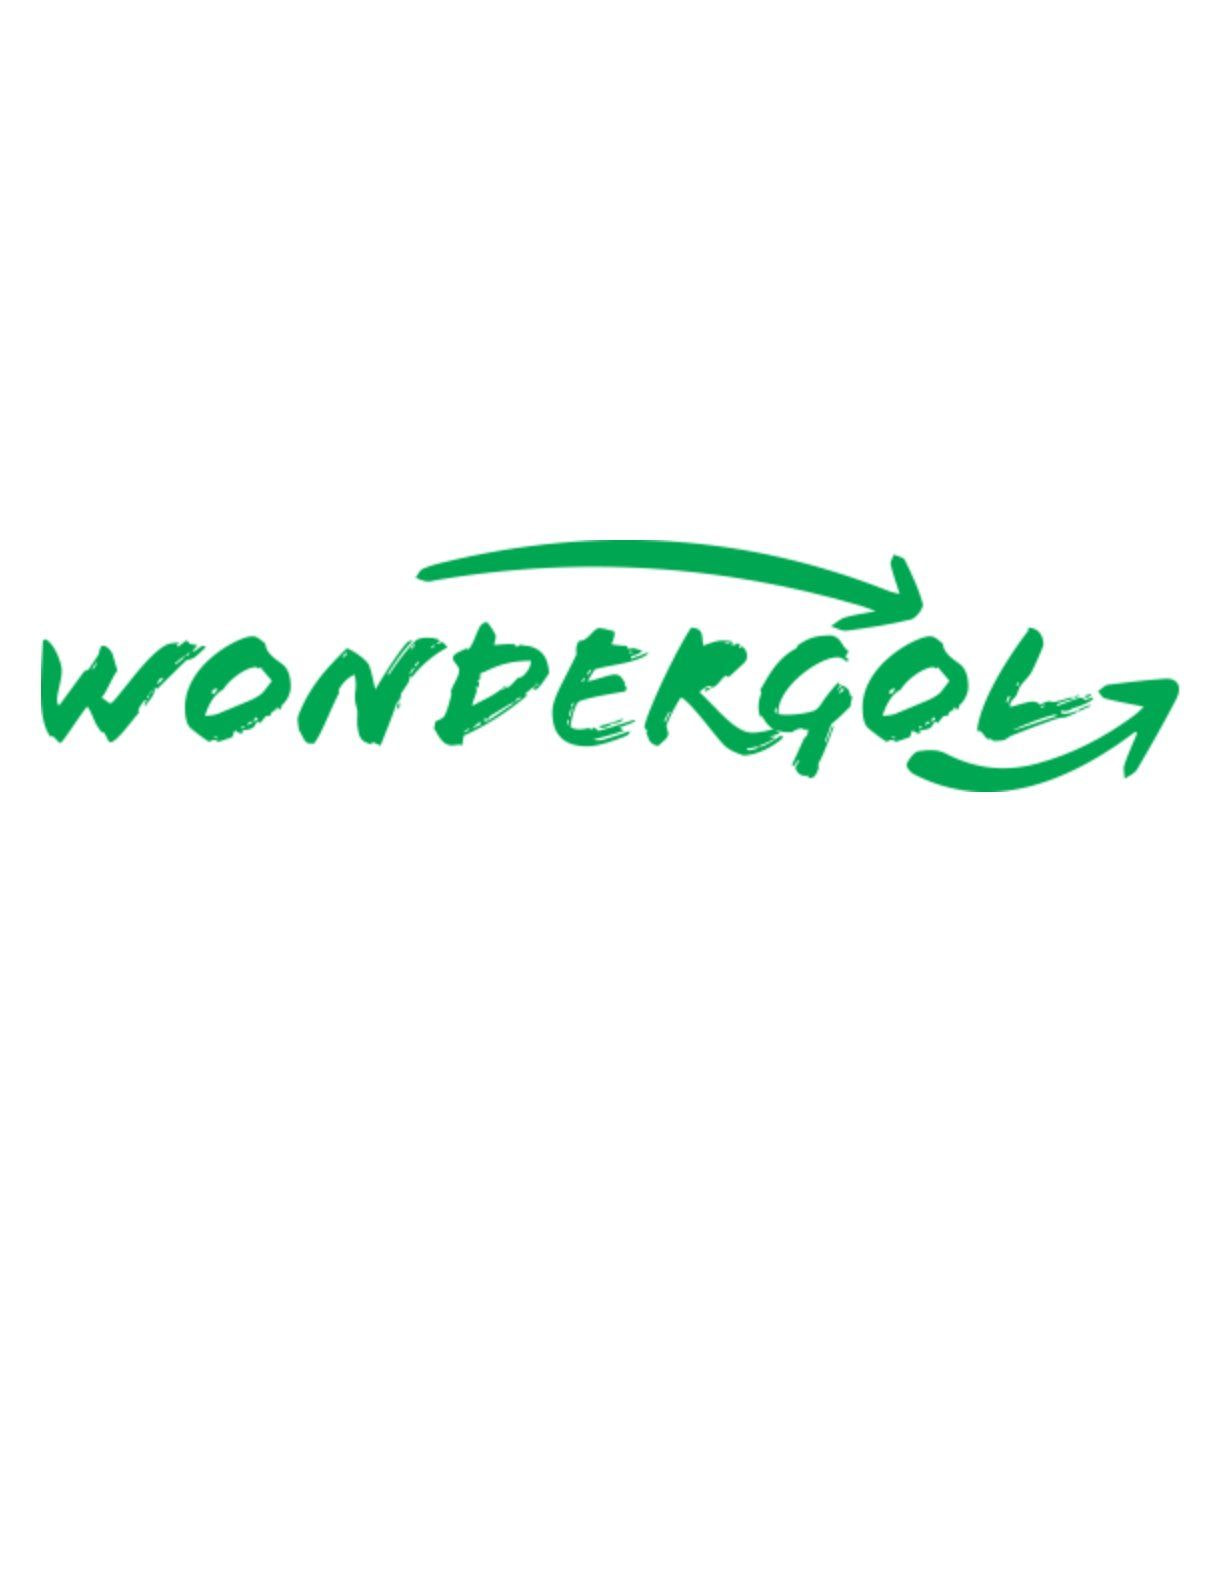 Wondergol